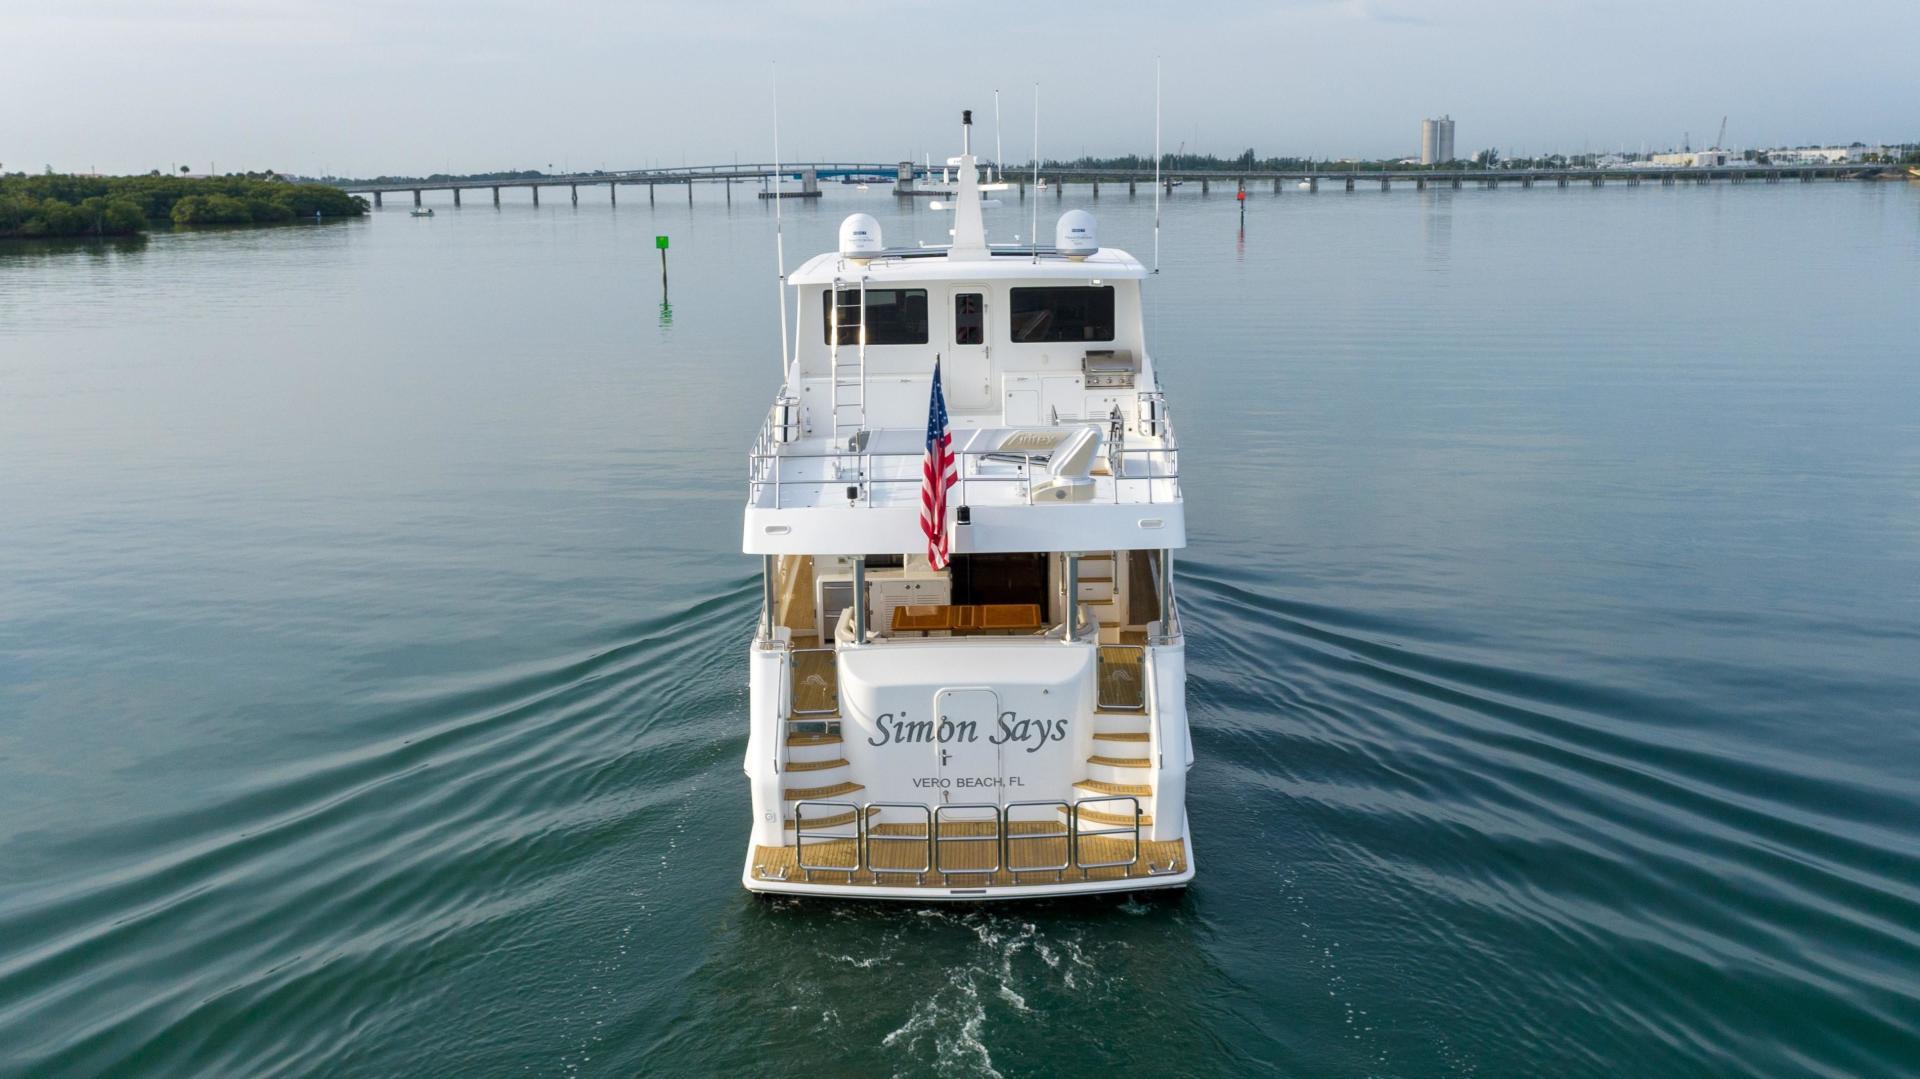 Outer Reef Yachts-860 DBMY 2017-Simon Says Vero Beach-Florida-United States-1488198 | Thumbnail